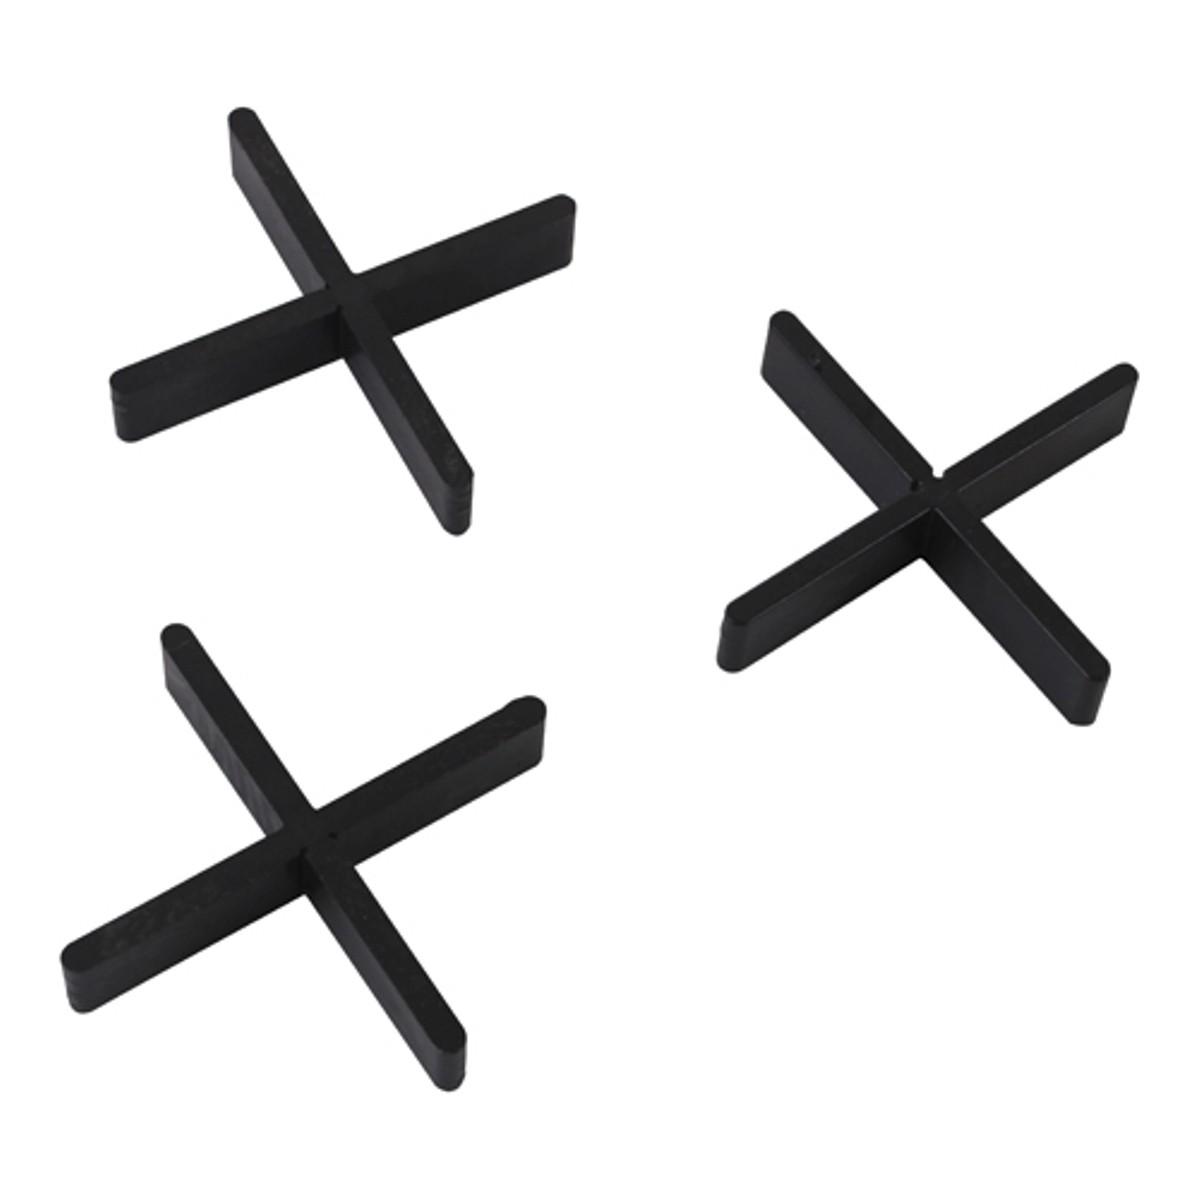 Voegkruis afbreekbaar zwart 3mm 10x55mm (100st.)